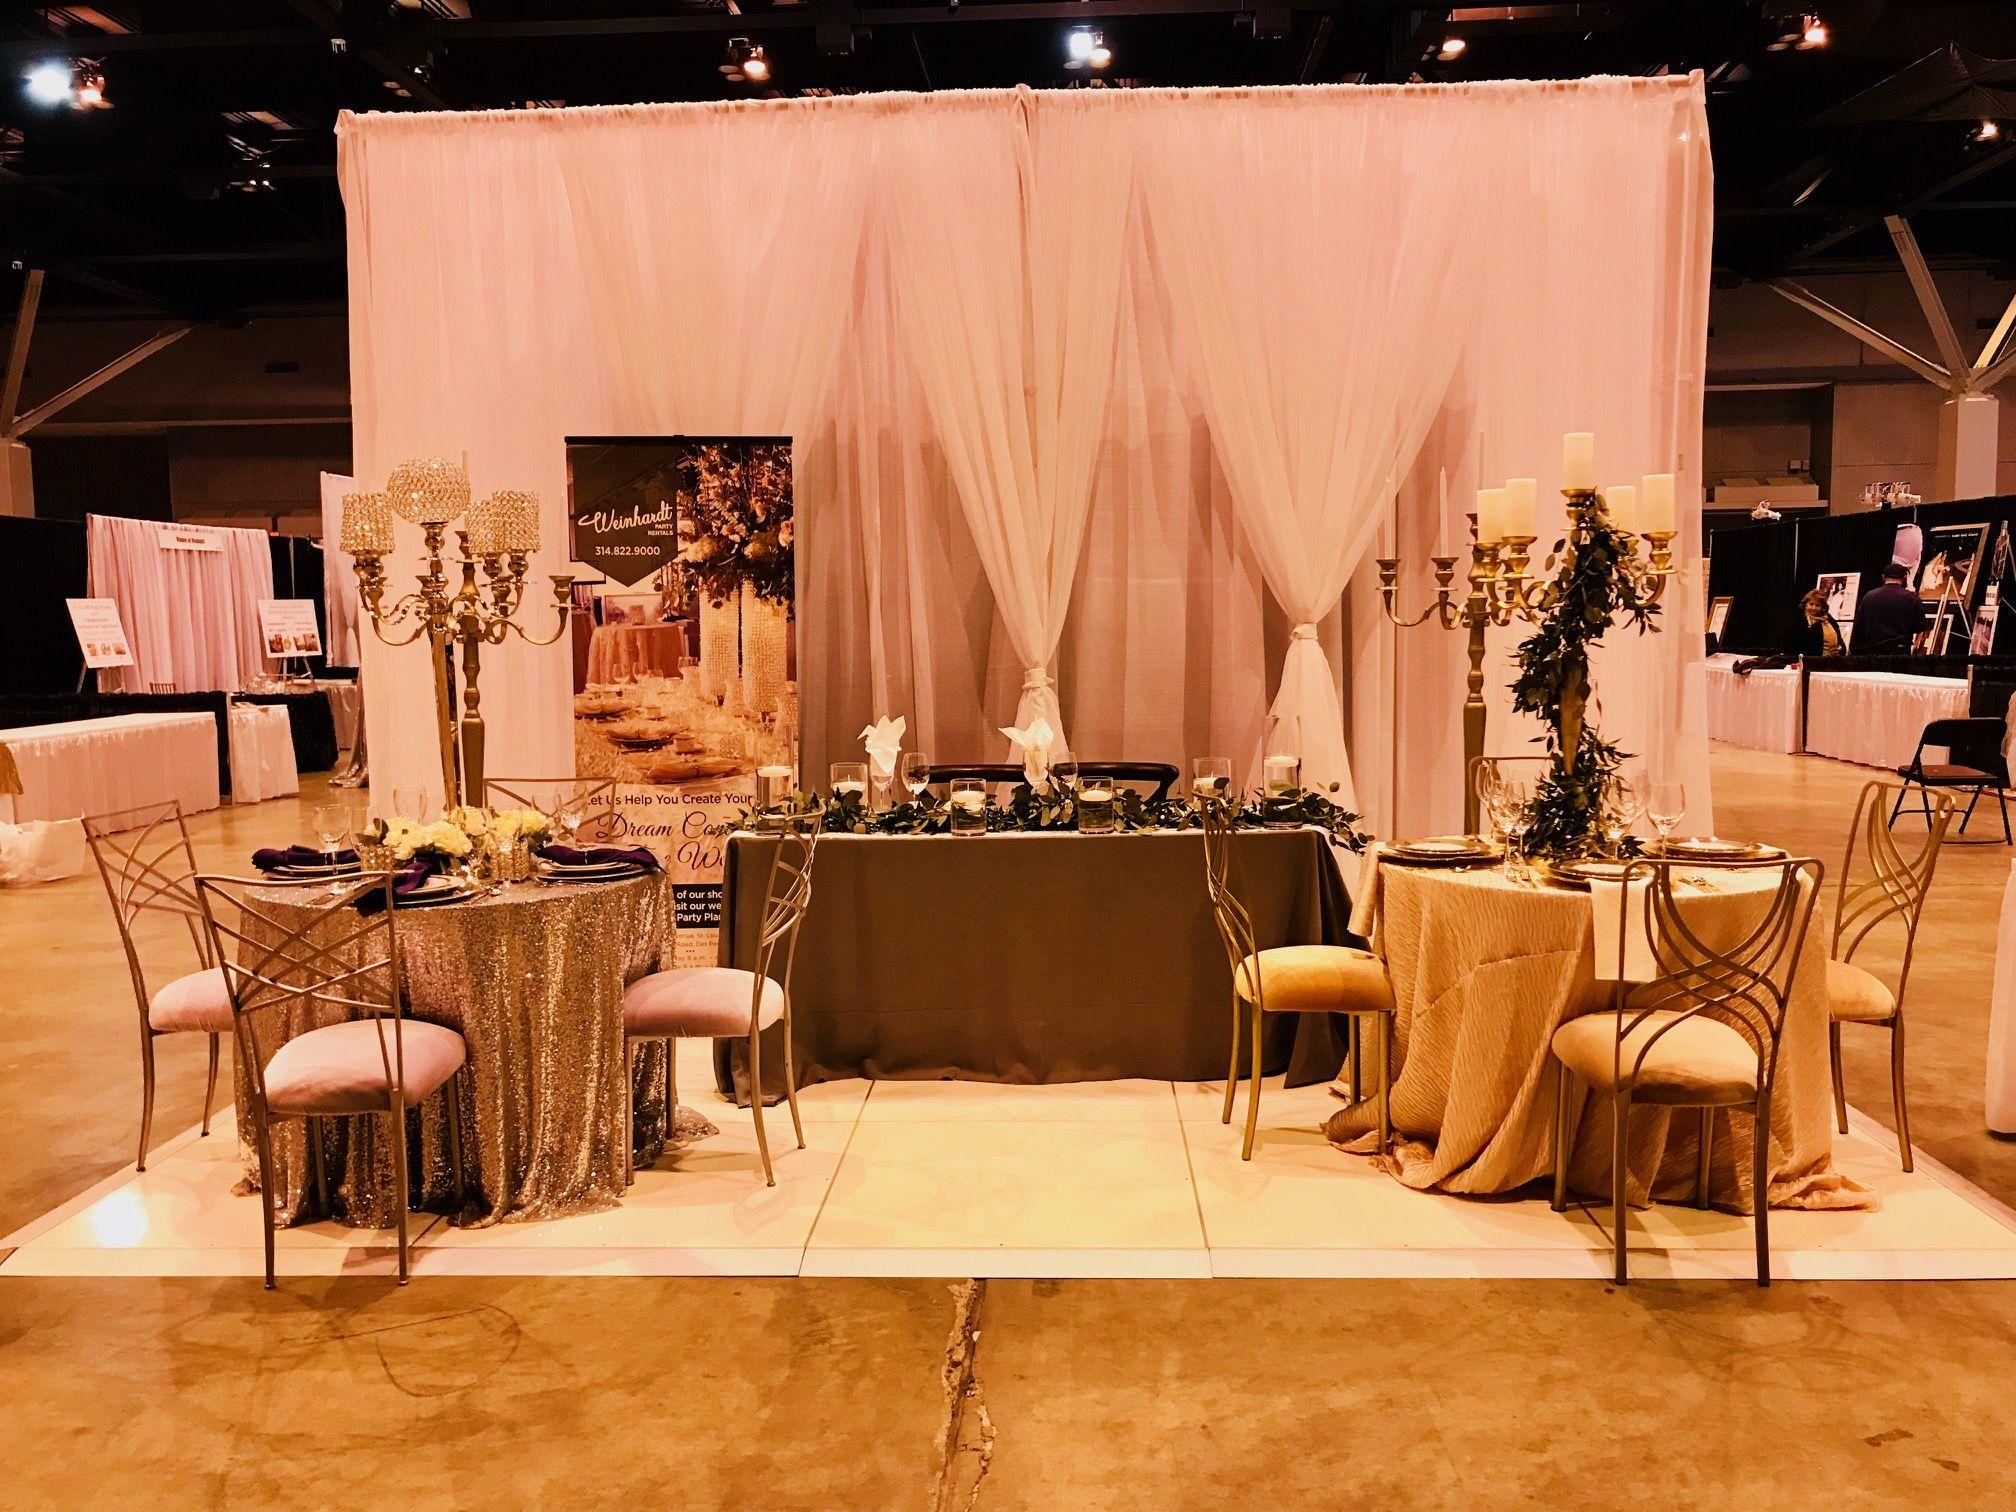 Party Rentals in St. Louis Wedding decorations, Wedding